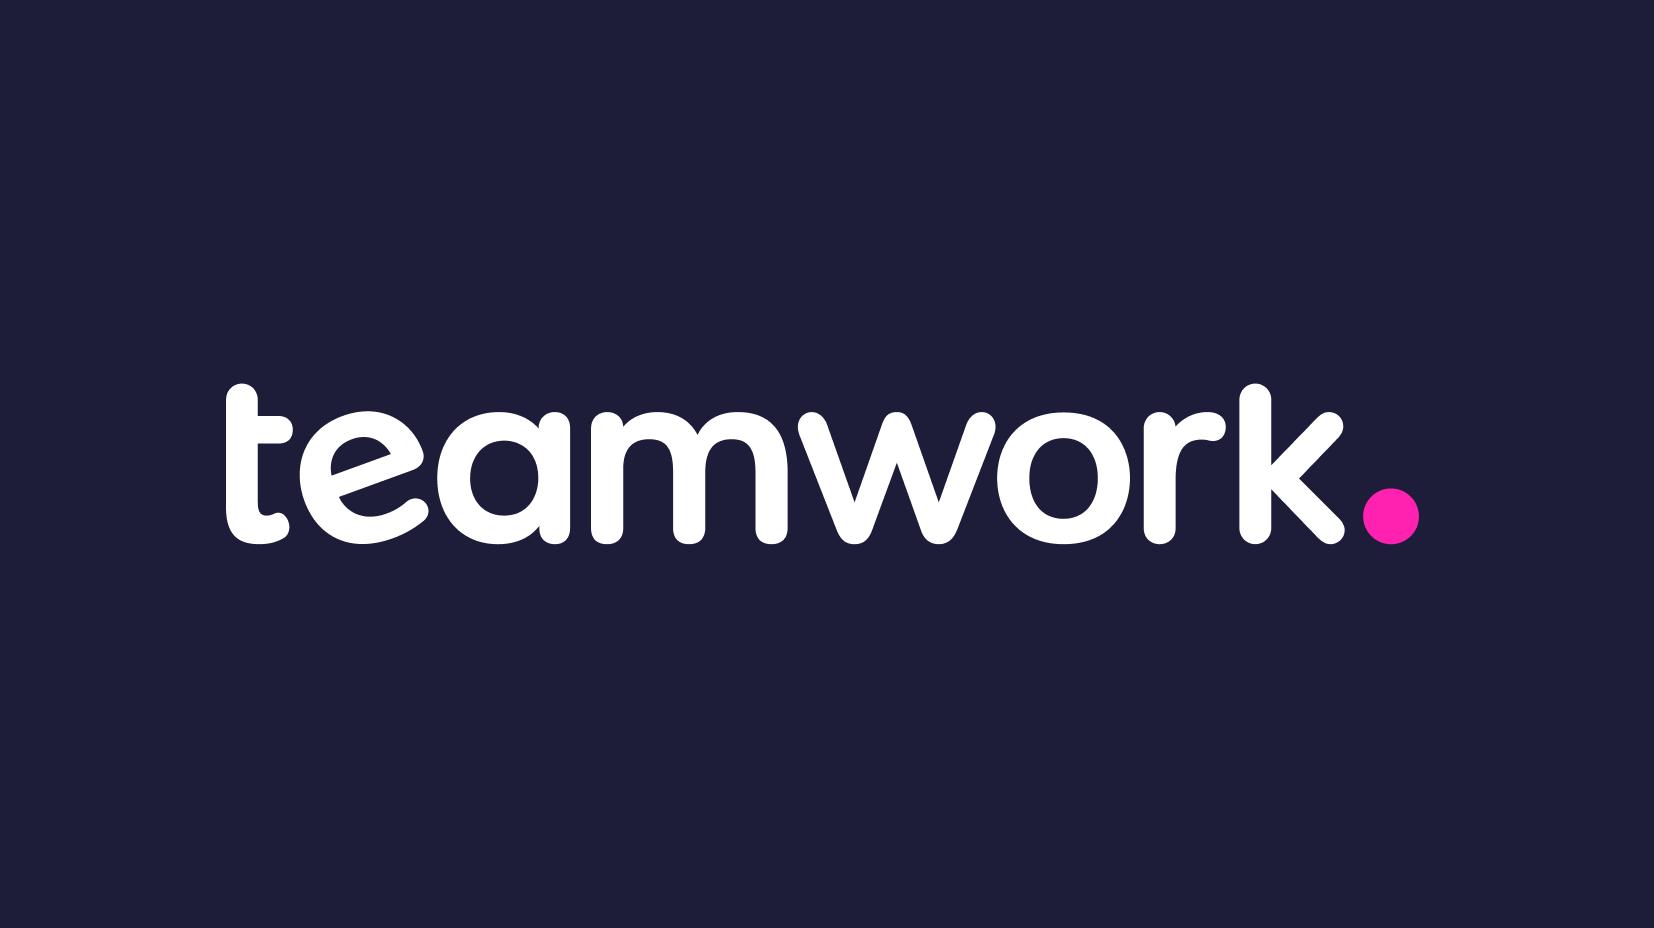 Tech & Product DD | Growth | Code & Co. advises Bregal Milestone on Teamwork.com